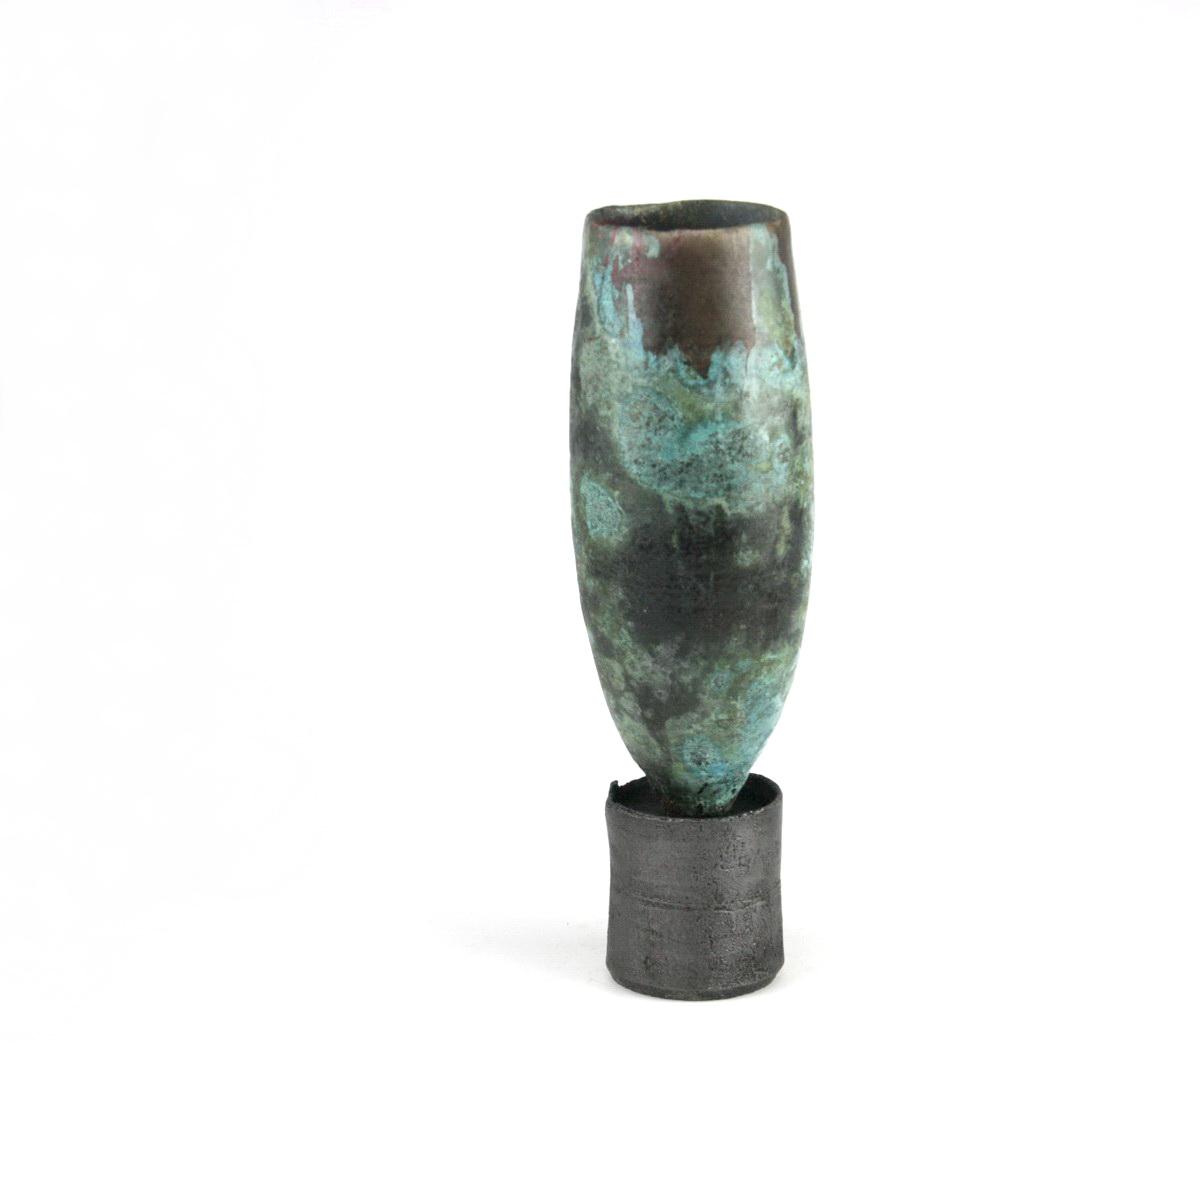 john-bedding-copper-glazed-pot-c75